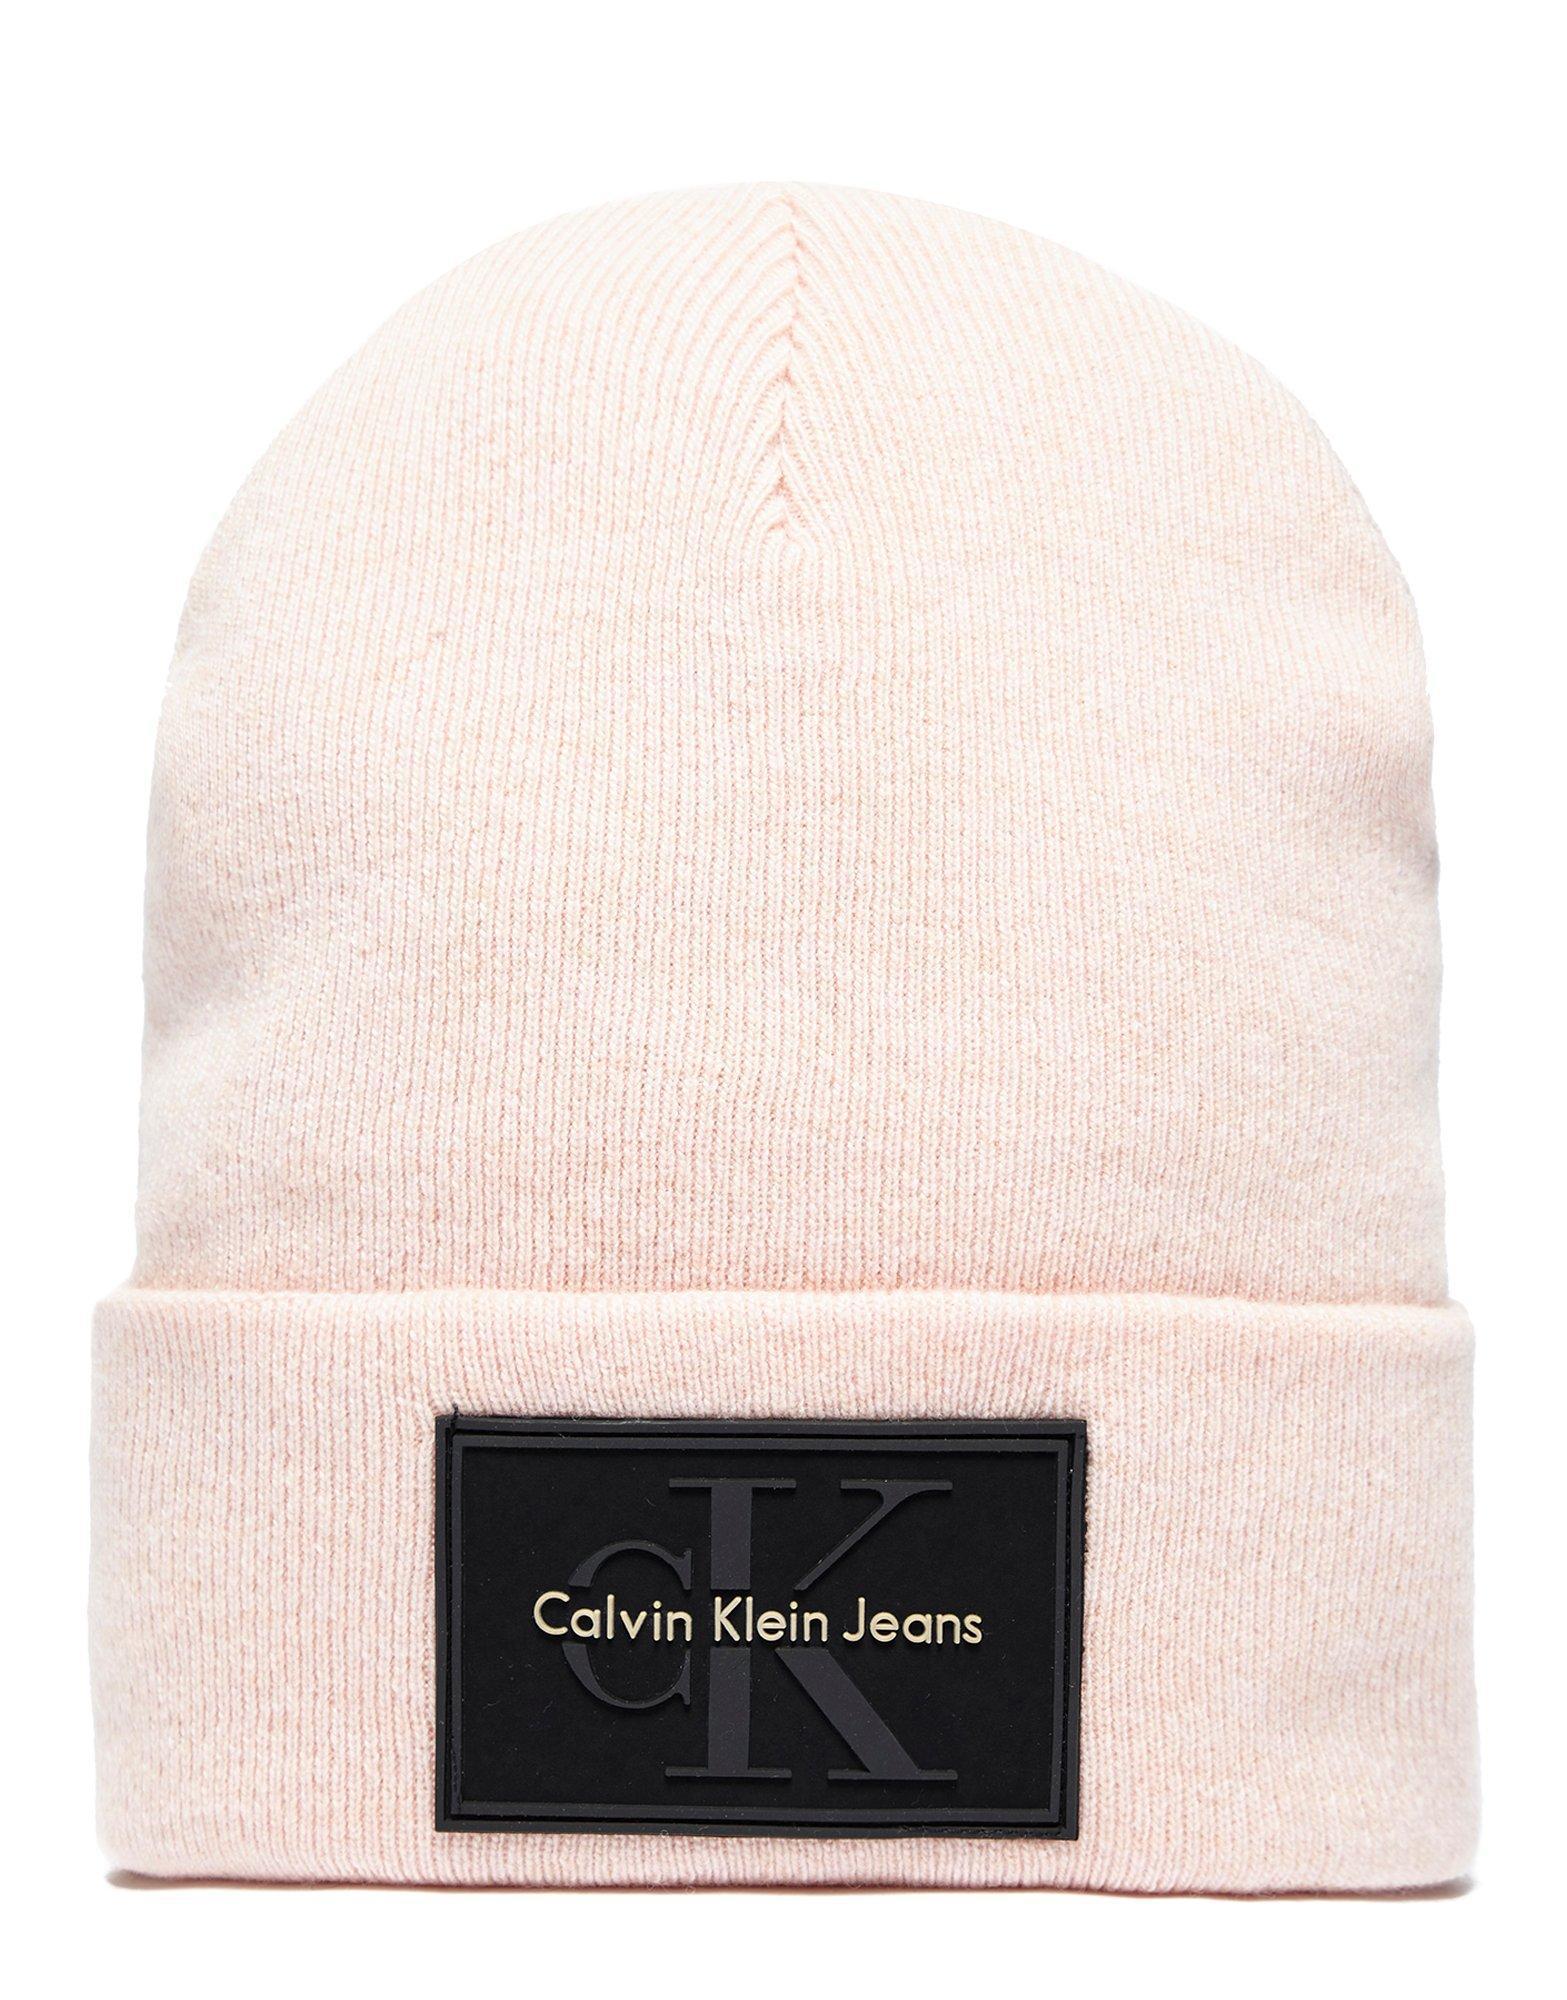 Knitted wool beanie CALVIN KLEIN 205W39NYC dOlmPHJLN